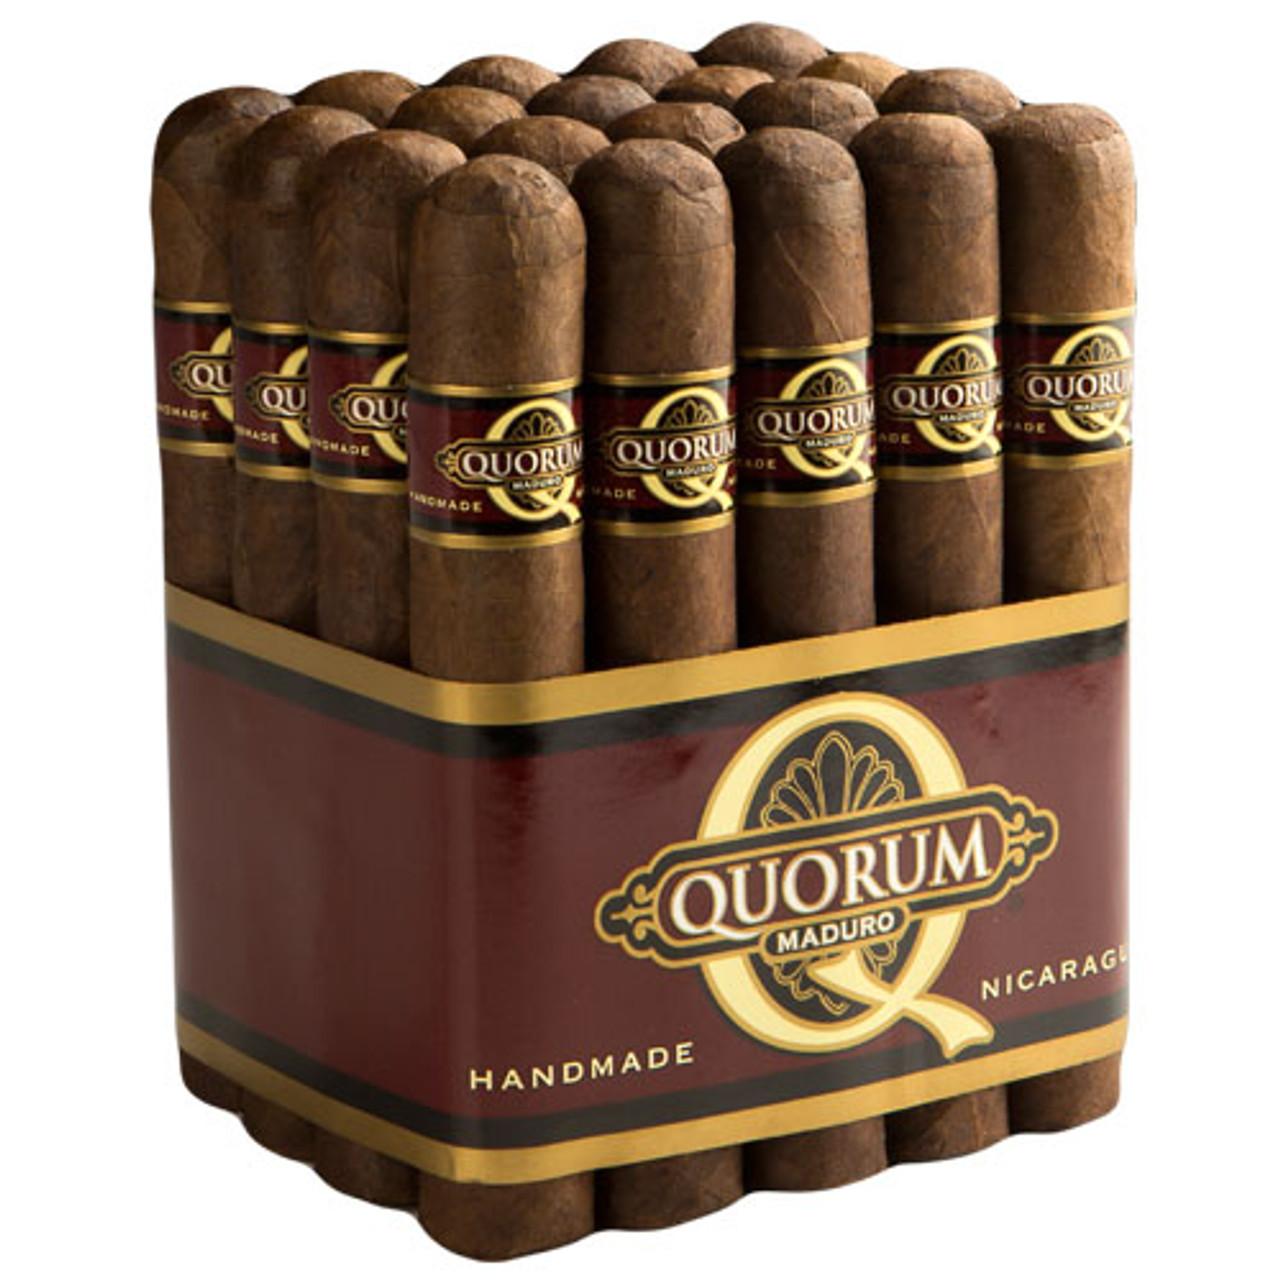 Quorum Maduro Toro Cigars - 6 x 50 (Bundle of 20)